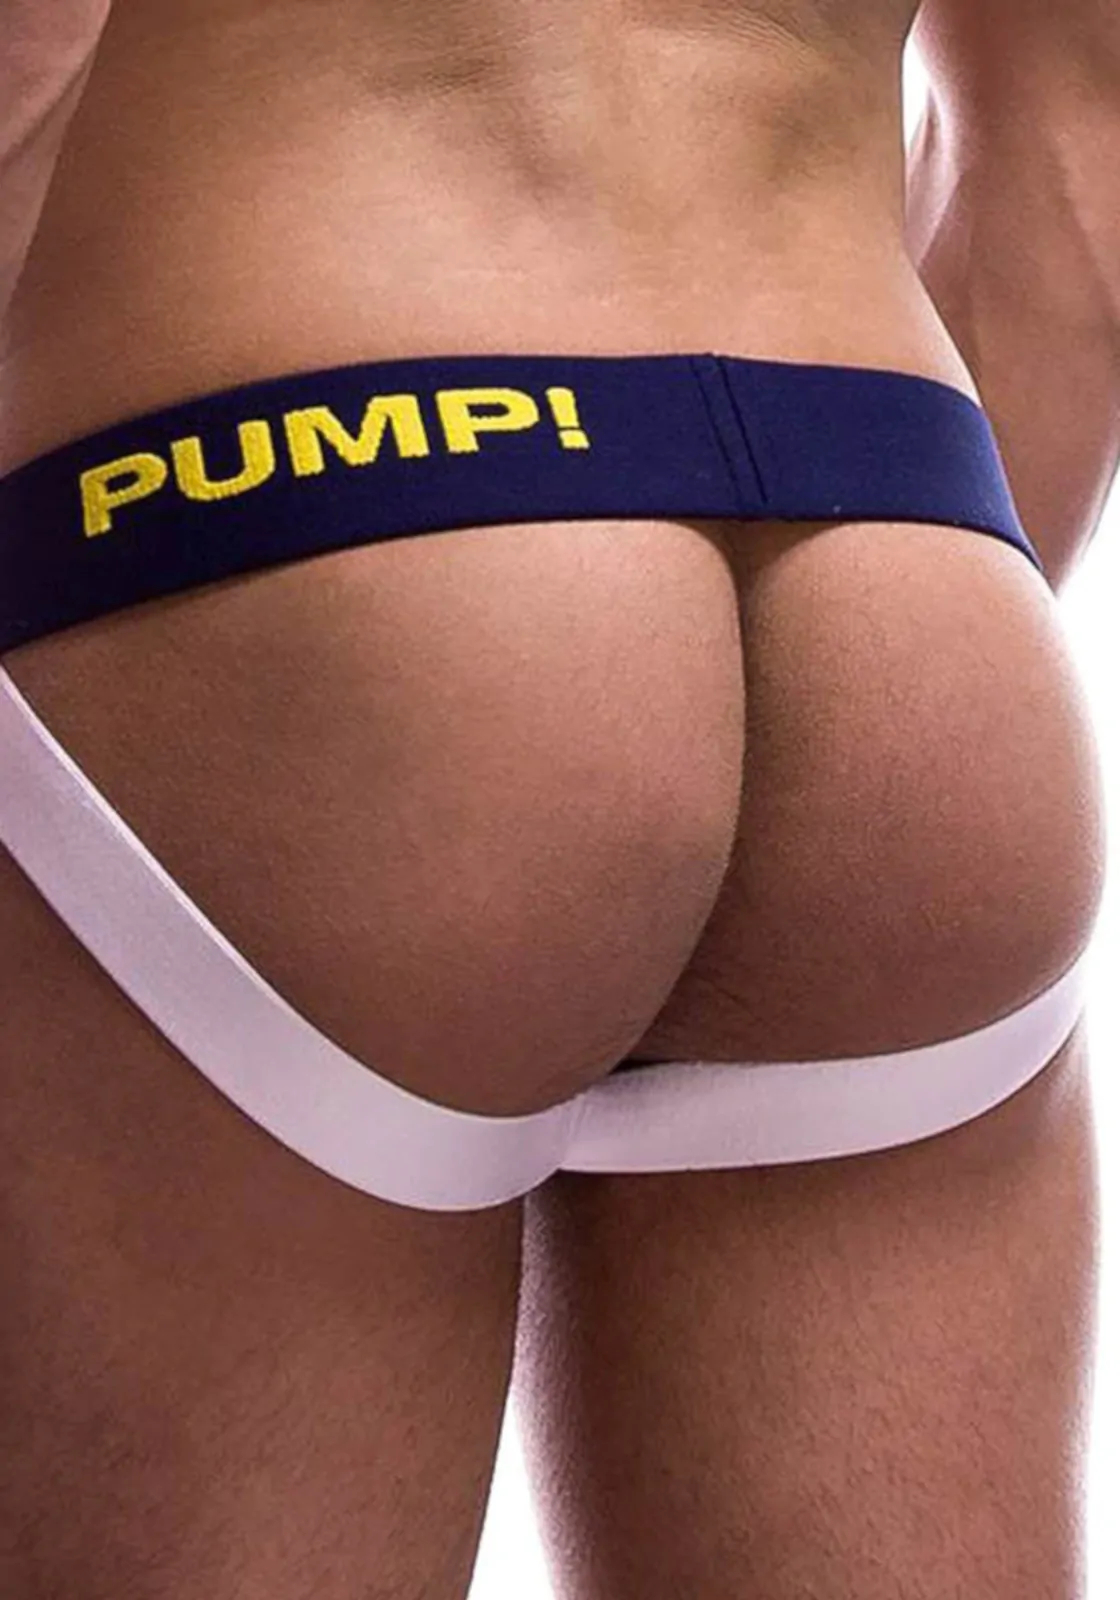 PUMP! Fratboy Jock